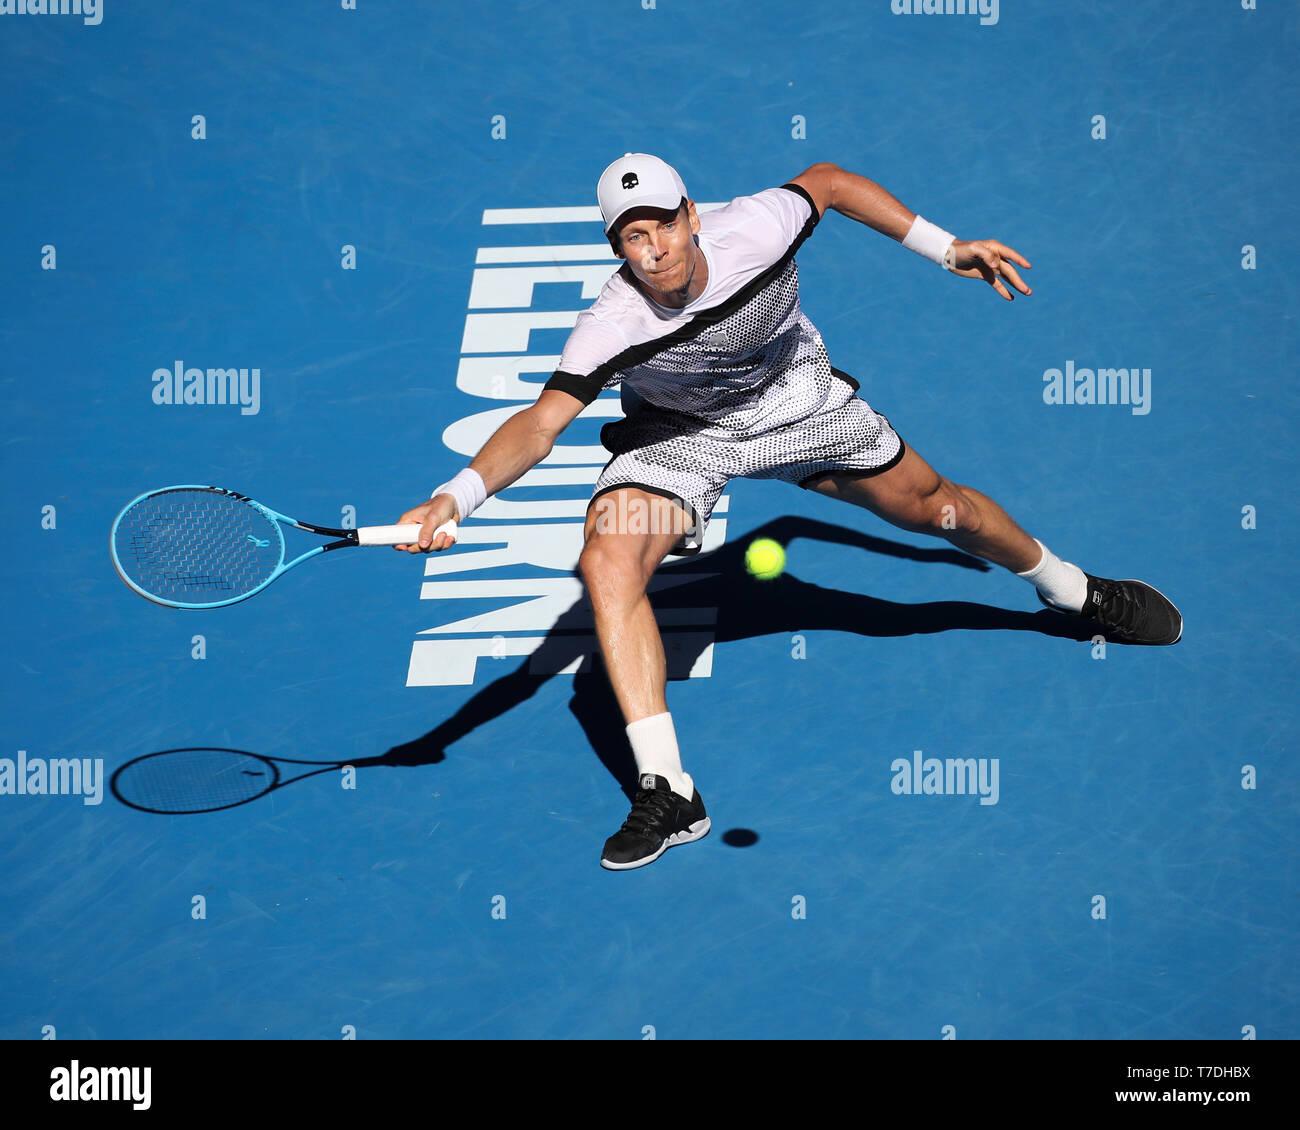 Czech tennis player Tomas Berdych playing forehand shot in Australian Open 2019 tennis tournament, Melbourne Park, Melbourne, Victoria, Australia - Stock Image